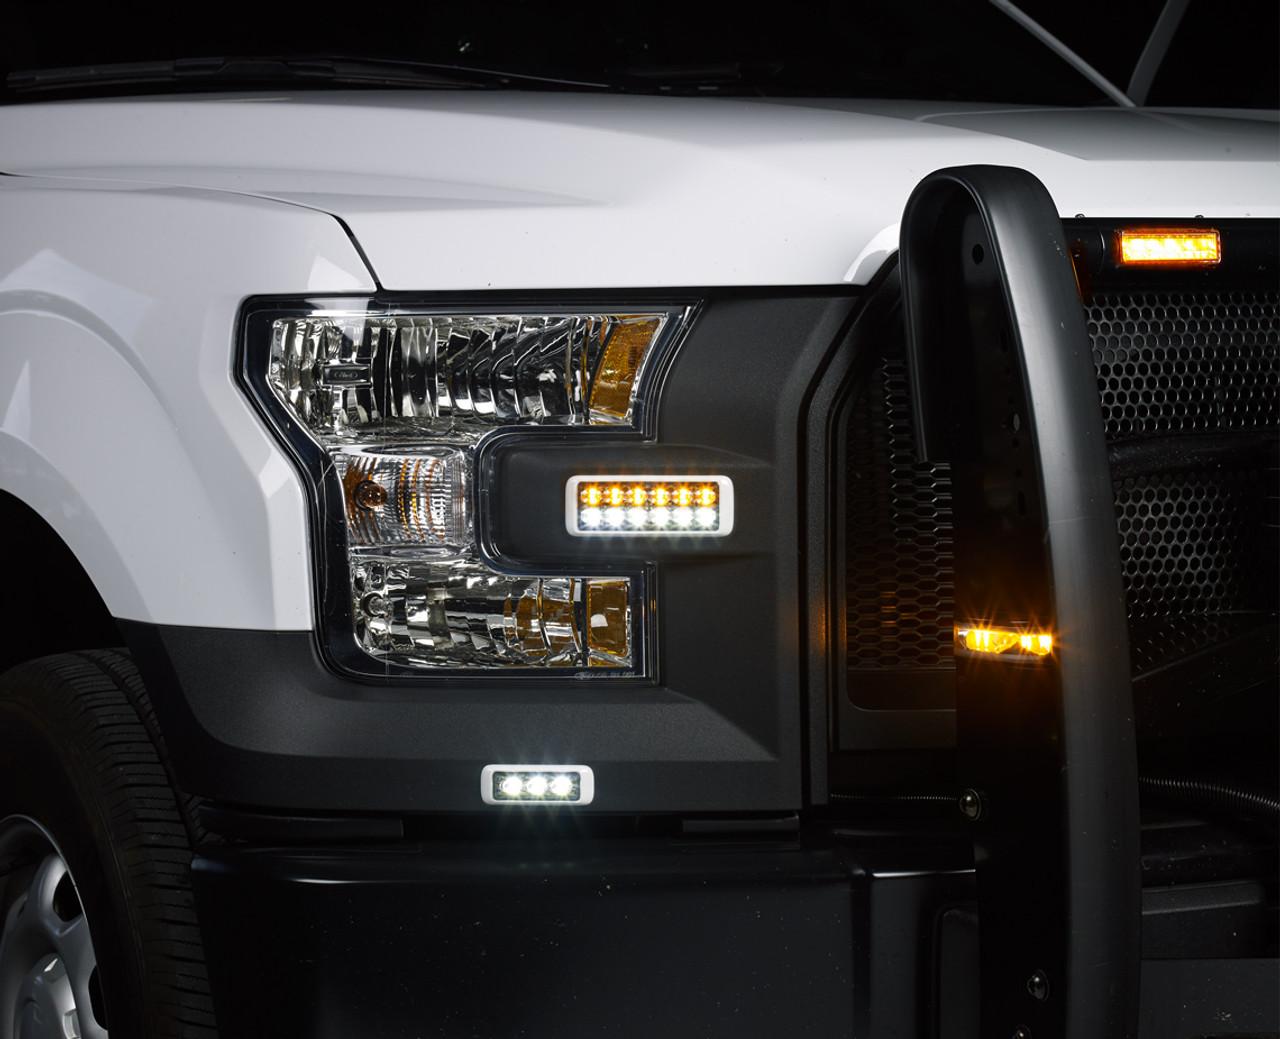 Federal Signal MicroPulse 6 LED Hood Grille or Flush Mount Light Head